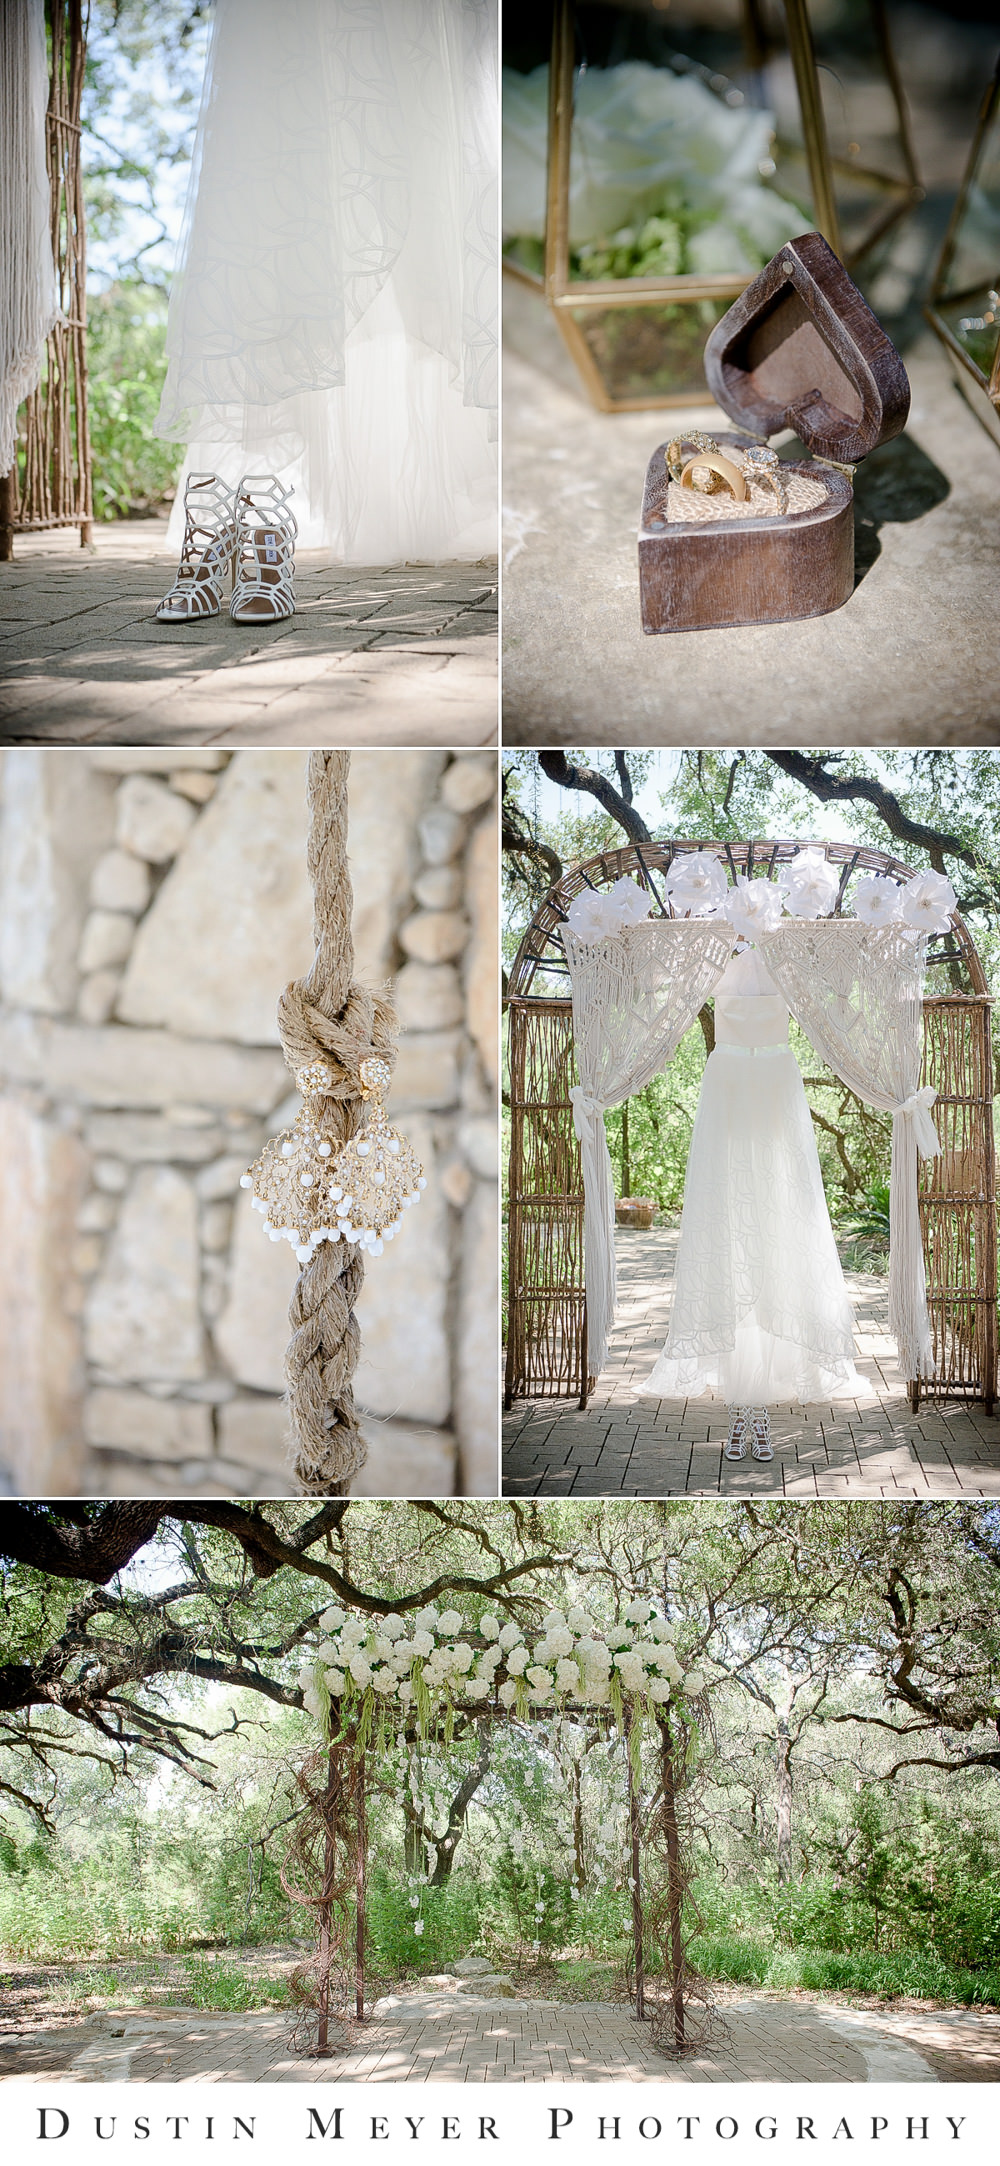 wedding details, wedding rings,  bride shoes, bridal gown, wedding jewelry, wedding earrings, wedding florist